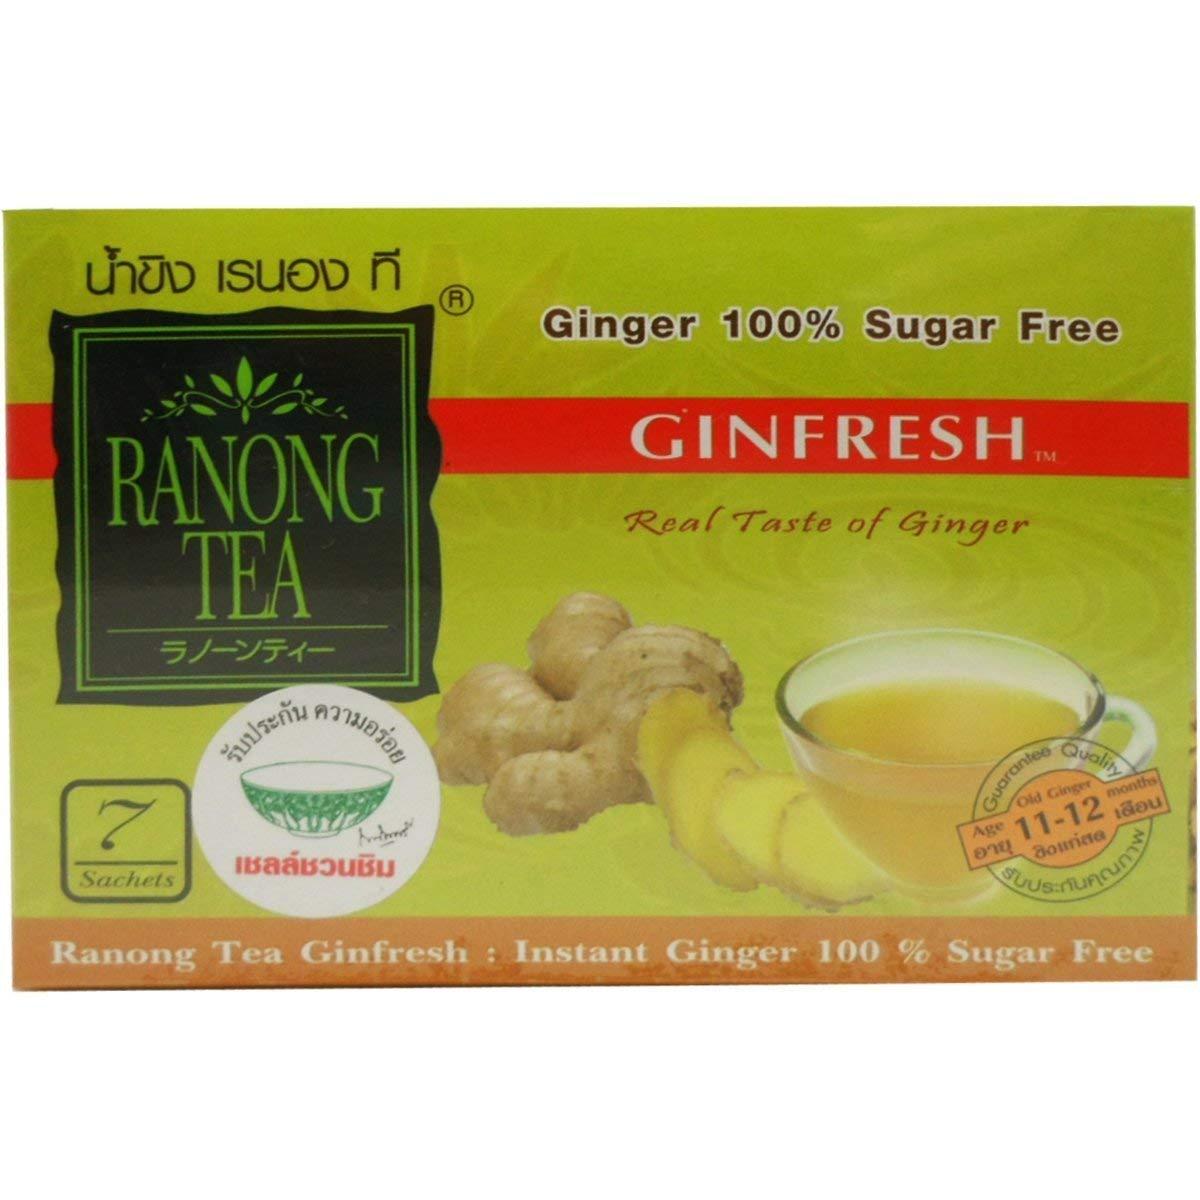 Ginfresh Instant Ginger Sugar Free Herbal Drink 100% Natural Net Wt 35 G (7 Sachets) Ranong-tea Brand X 3 Boxes